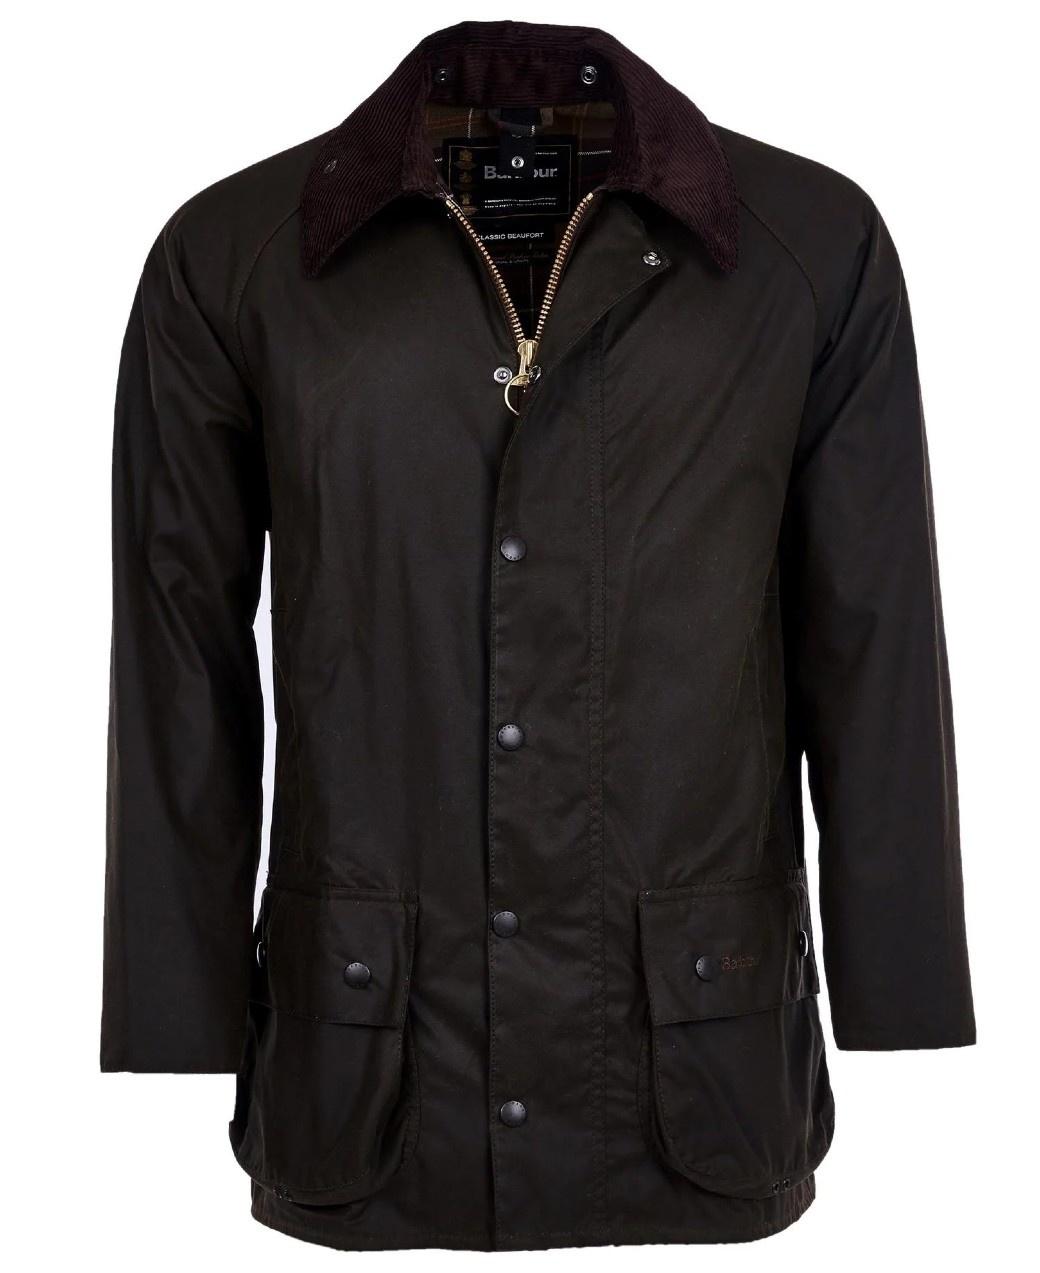 Barbour Classic Beaufort Wax Jacket Olive-1